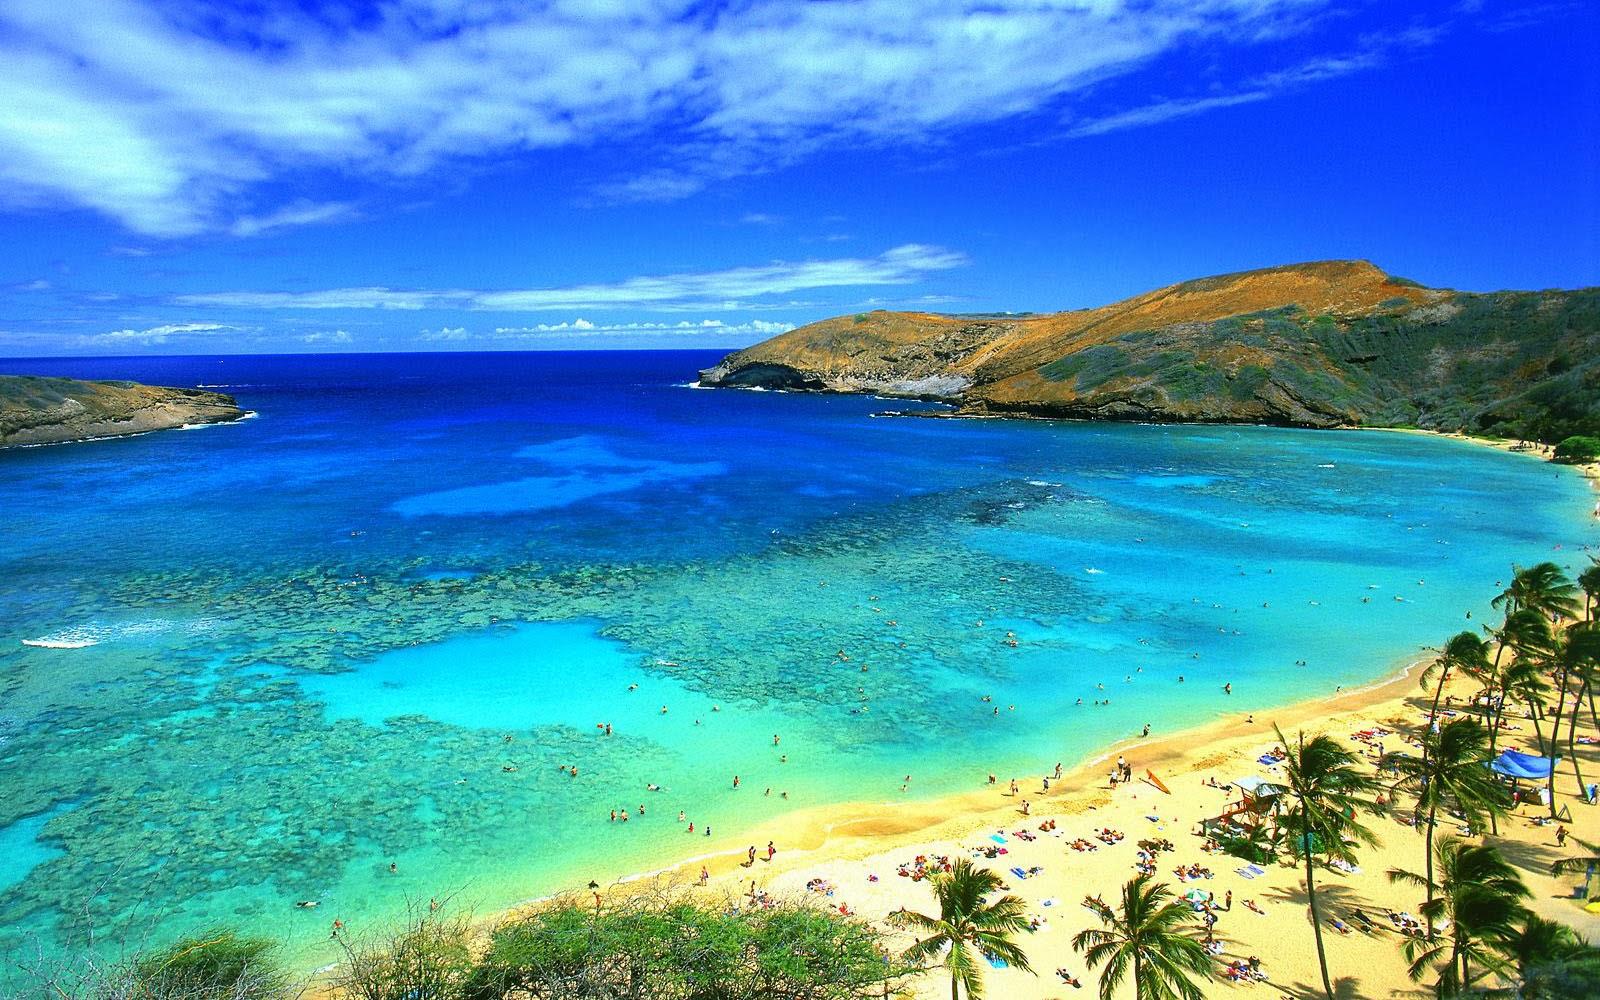 wallpapers hawaii wallpapers